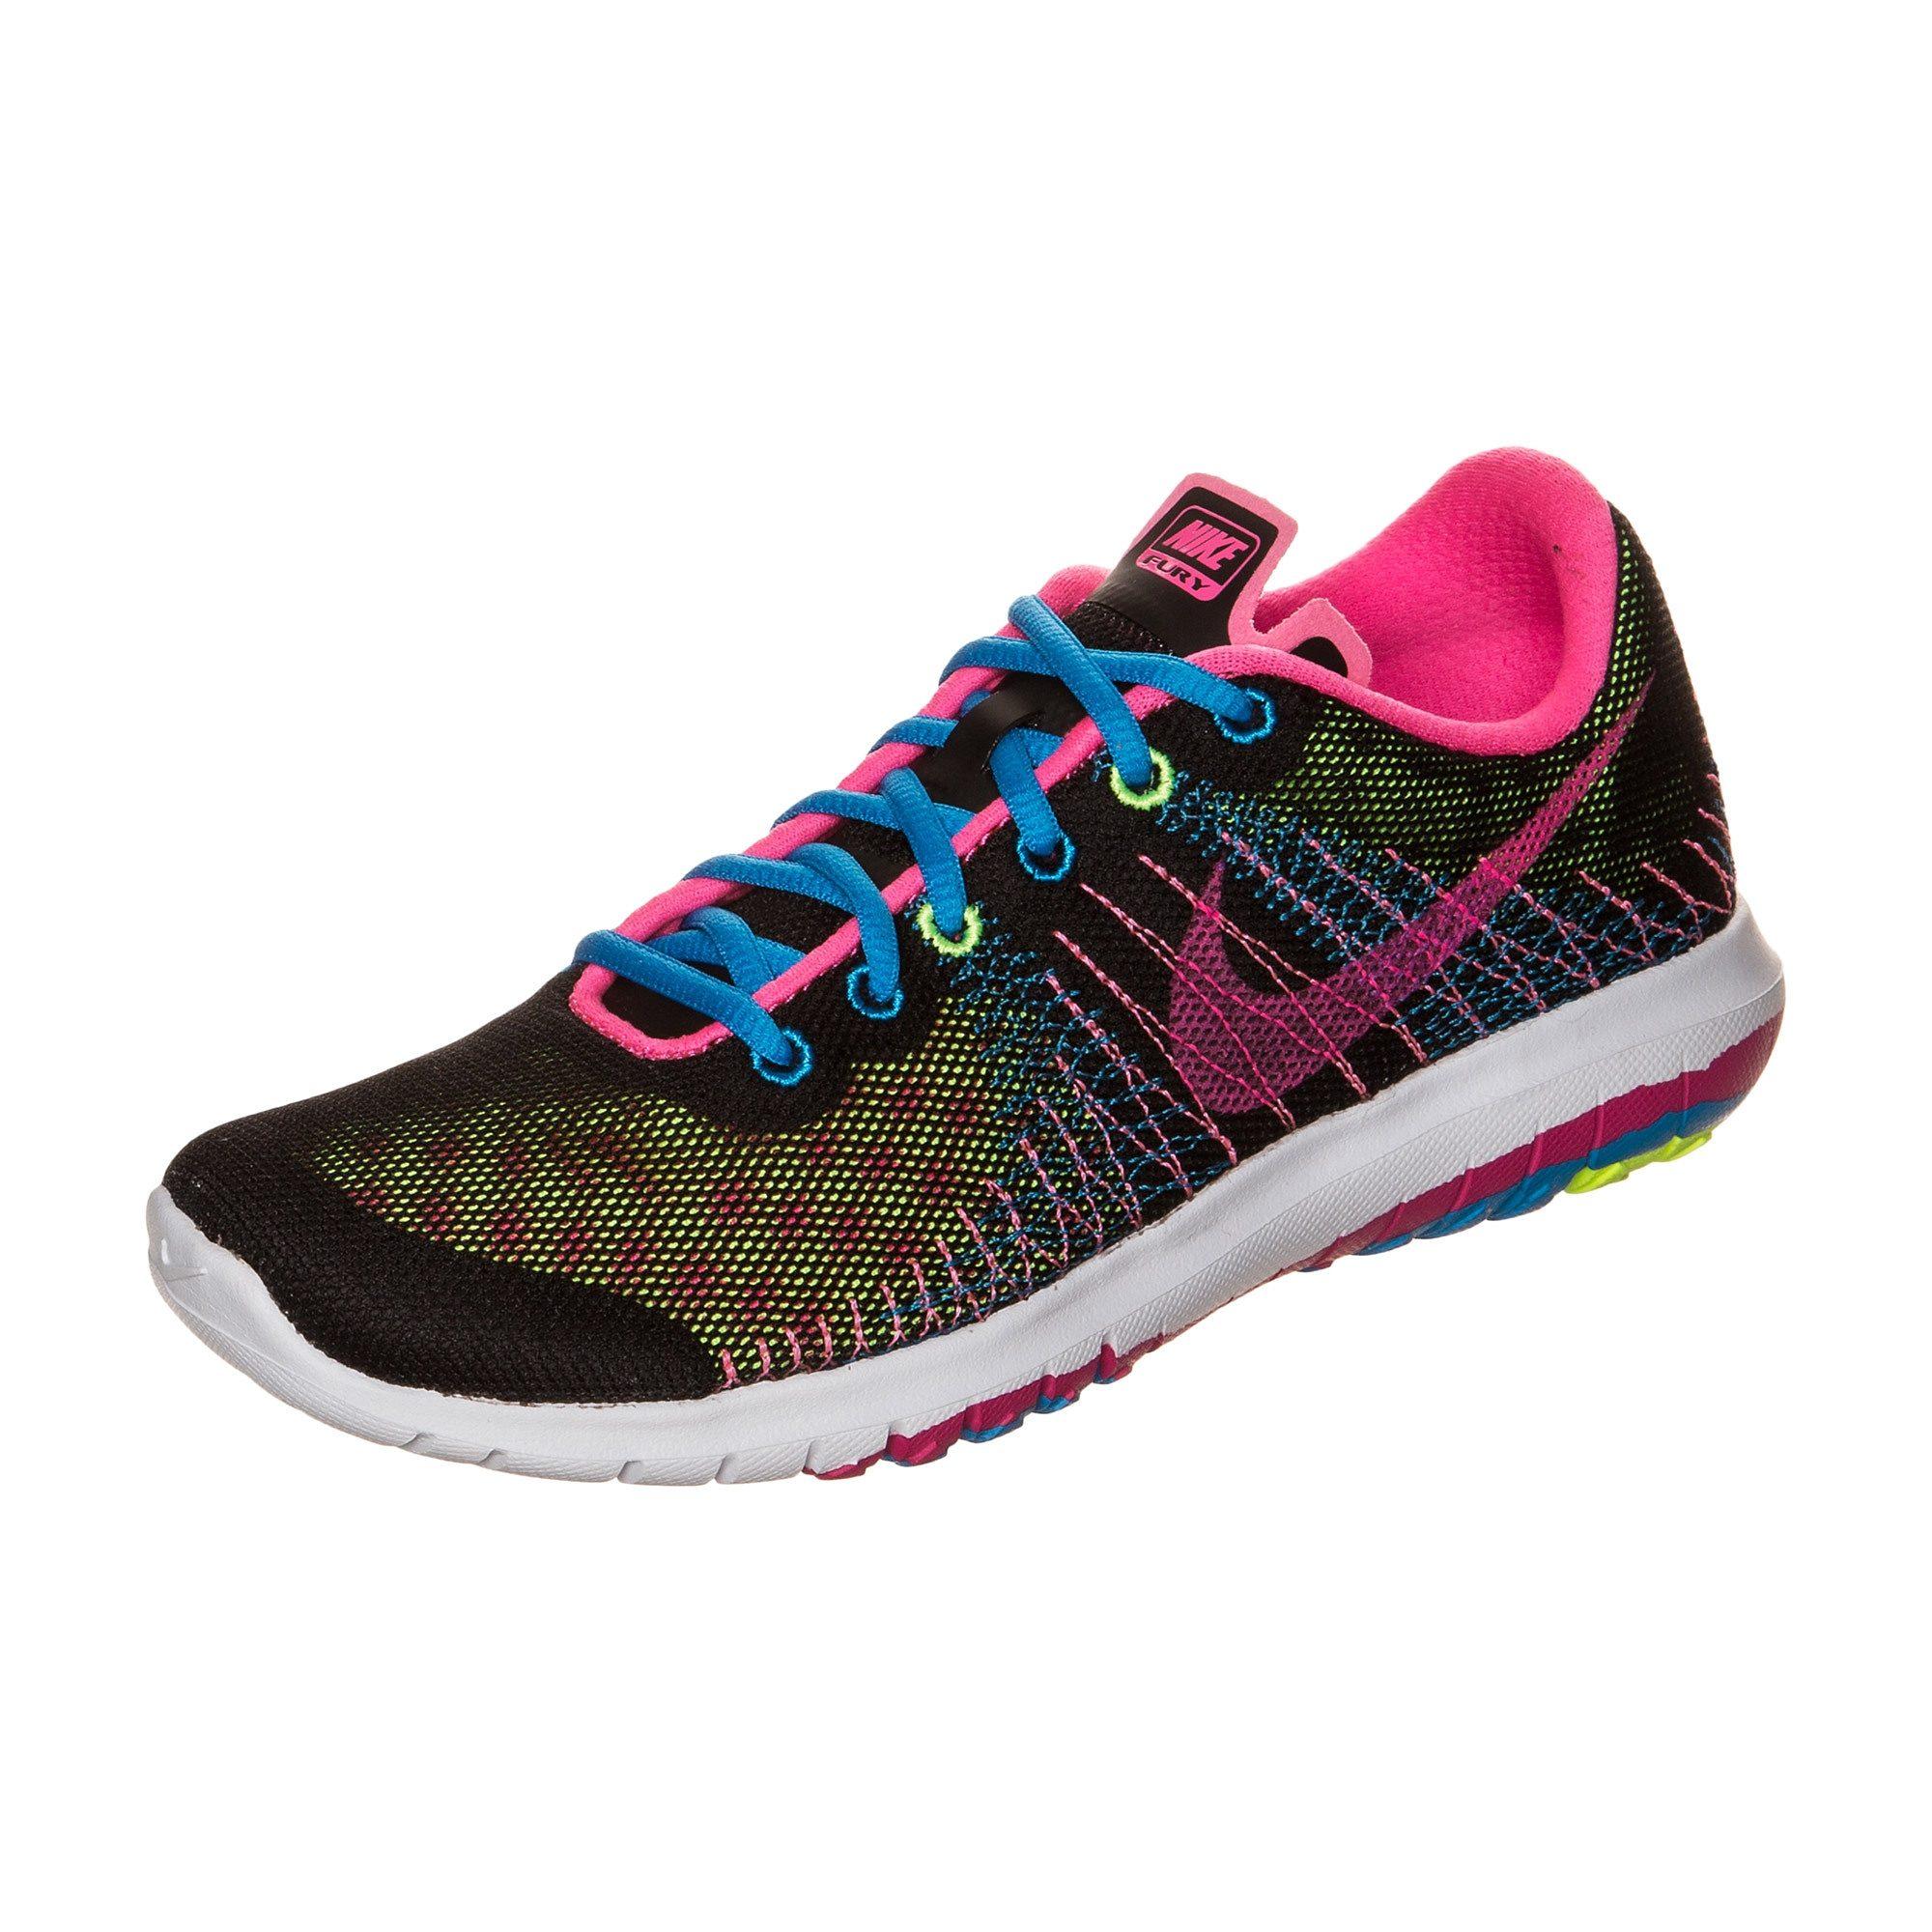 Nike Flex Fury Laufschuh Kinder, schwarz, Unisex